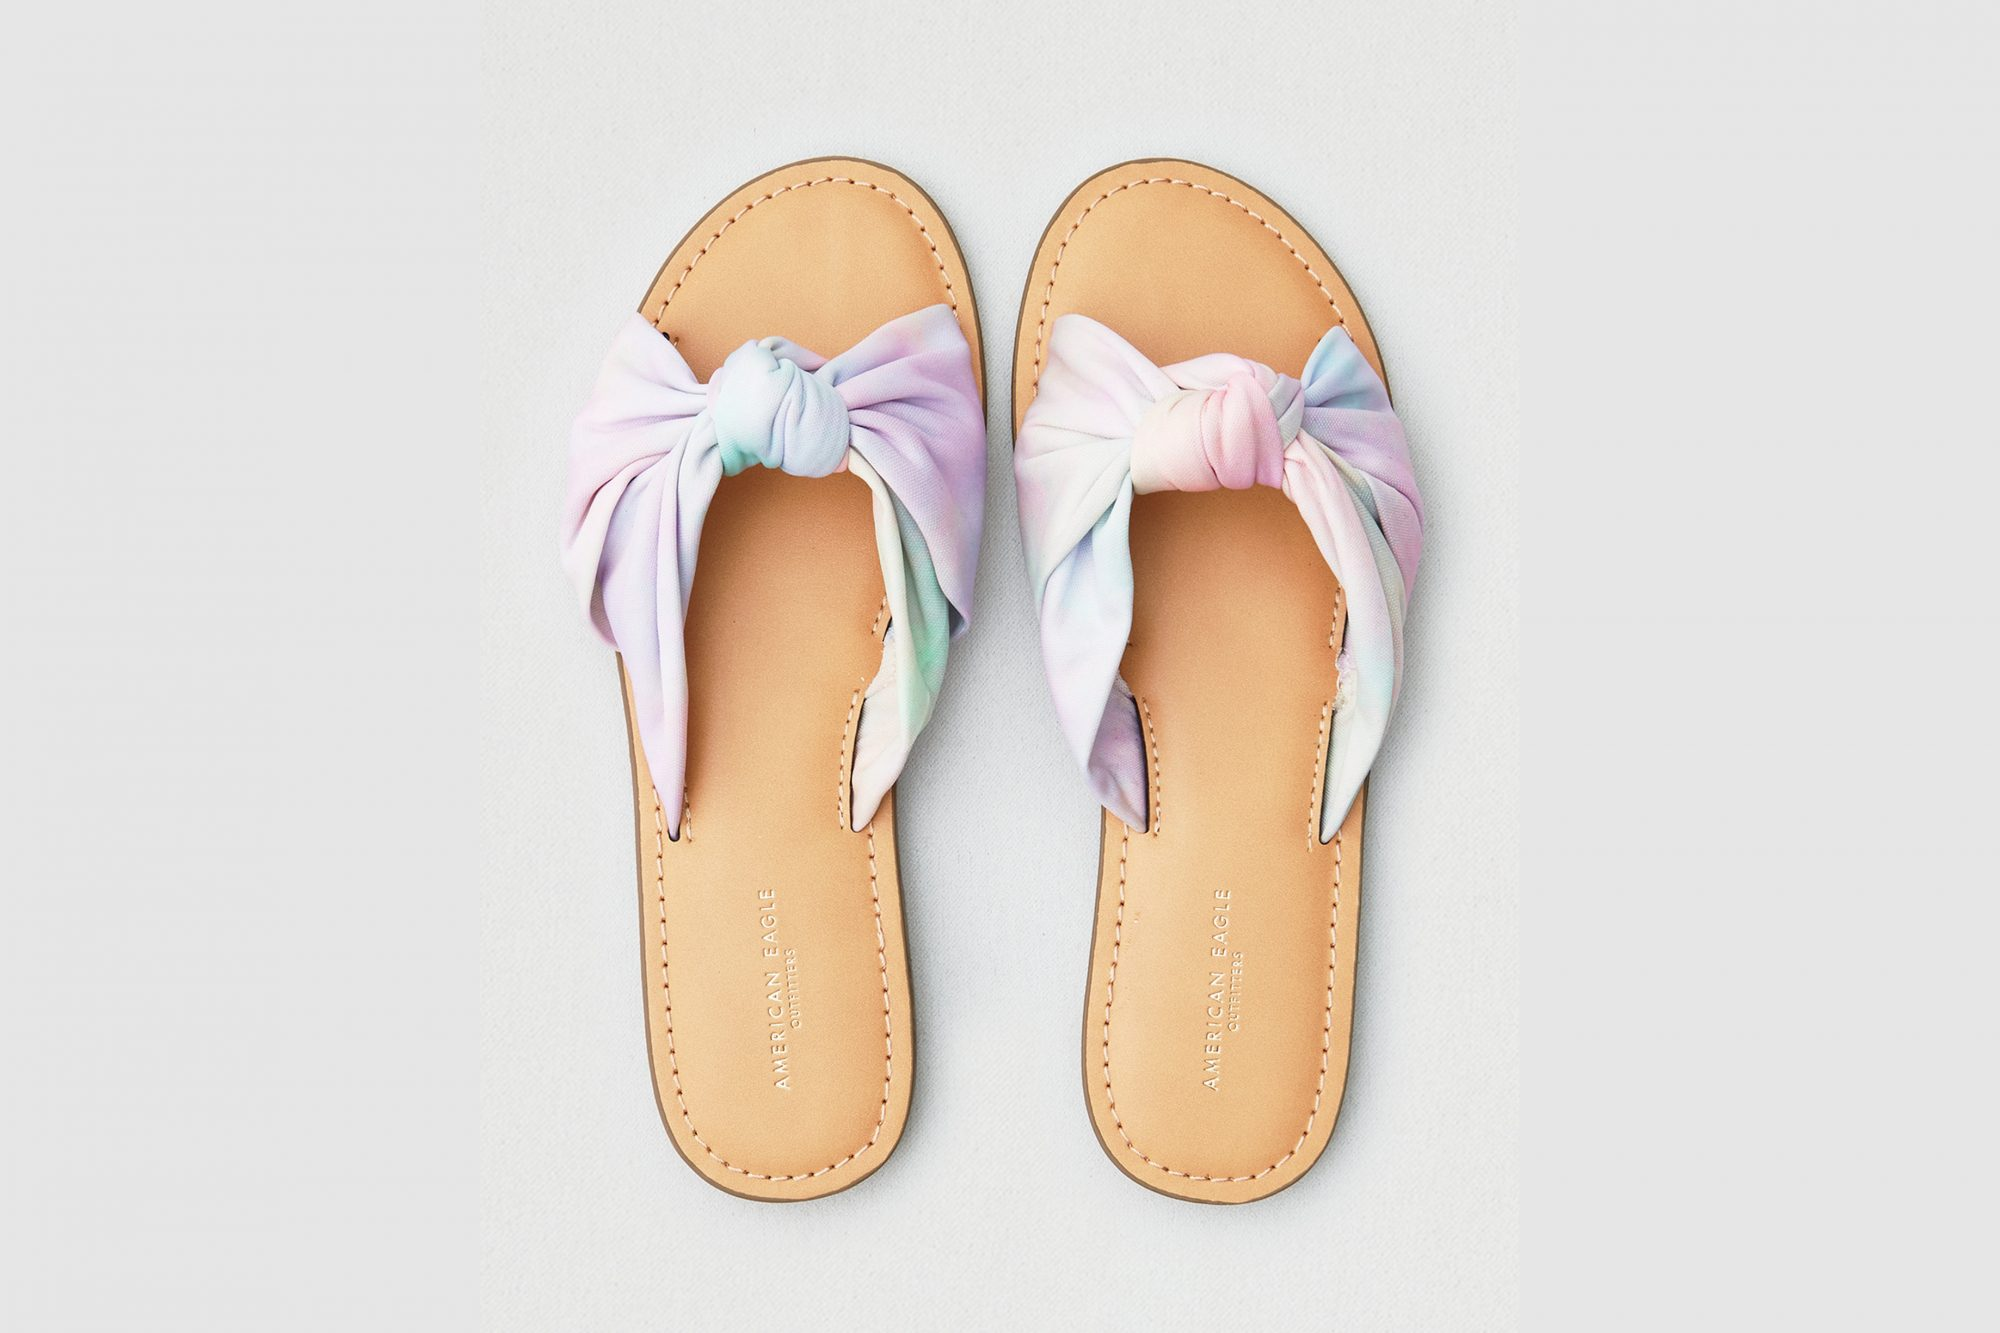 American Eagle tie-dye sandals